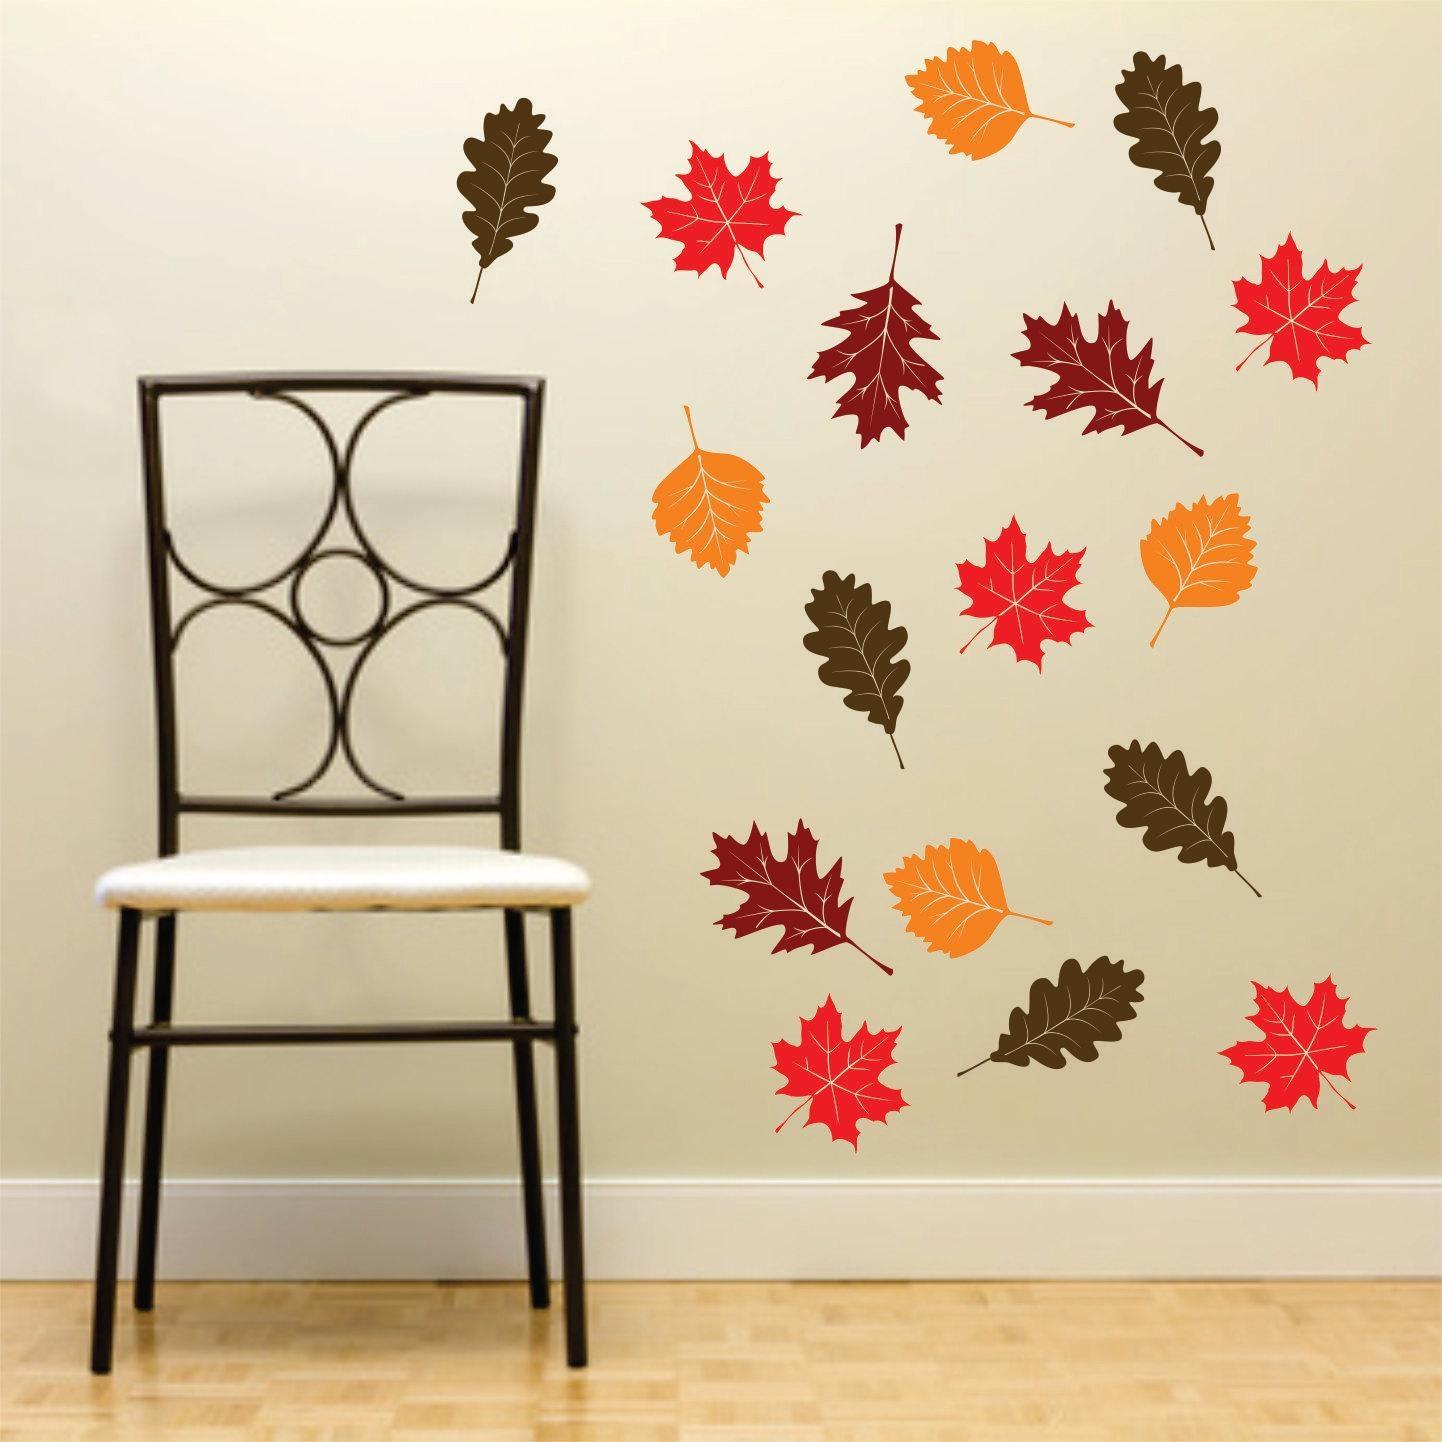 Fall Leaf Wall Decals Set Of 20 Autumn Leaves Vinyl Rub On Regarding Oak Tree Vinyl Wall Art (View 3 of 20)